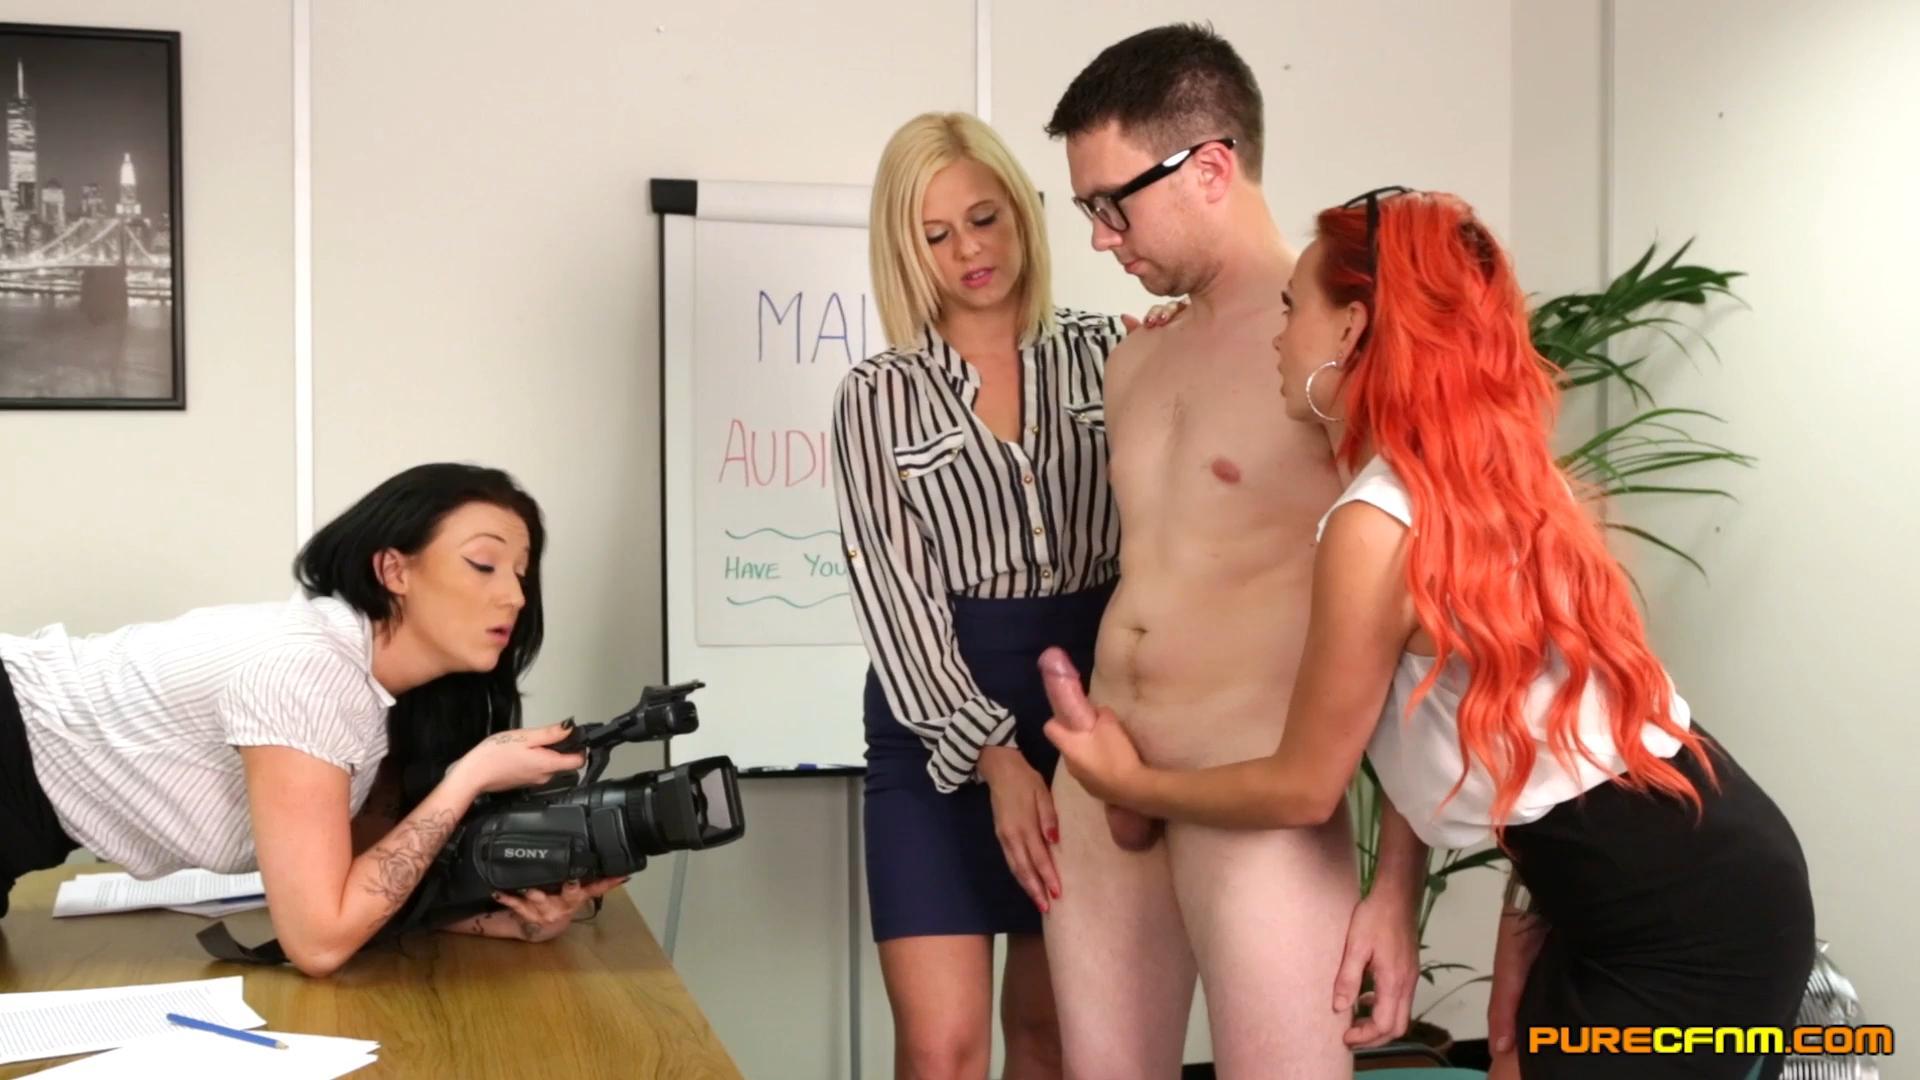 cfnm forum sex kontakt in köln